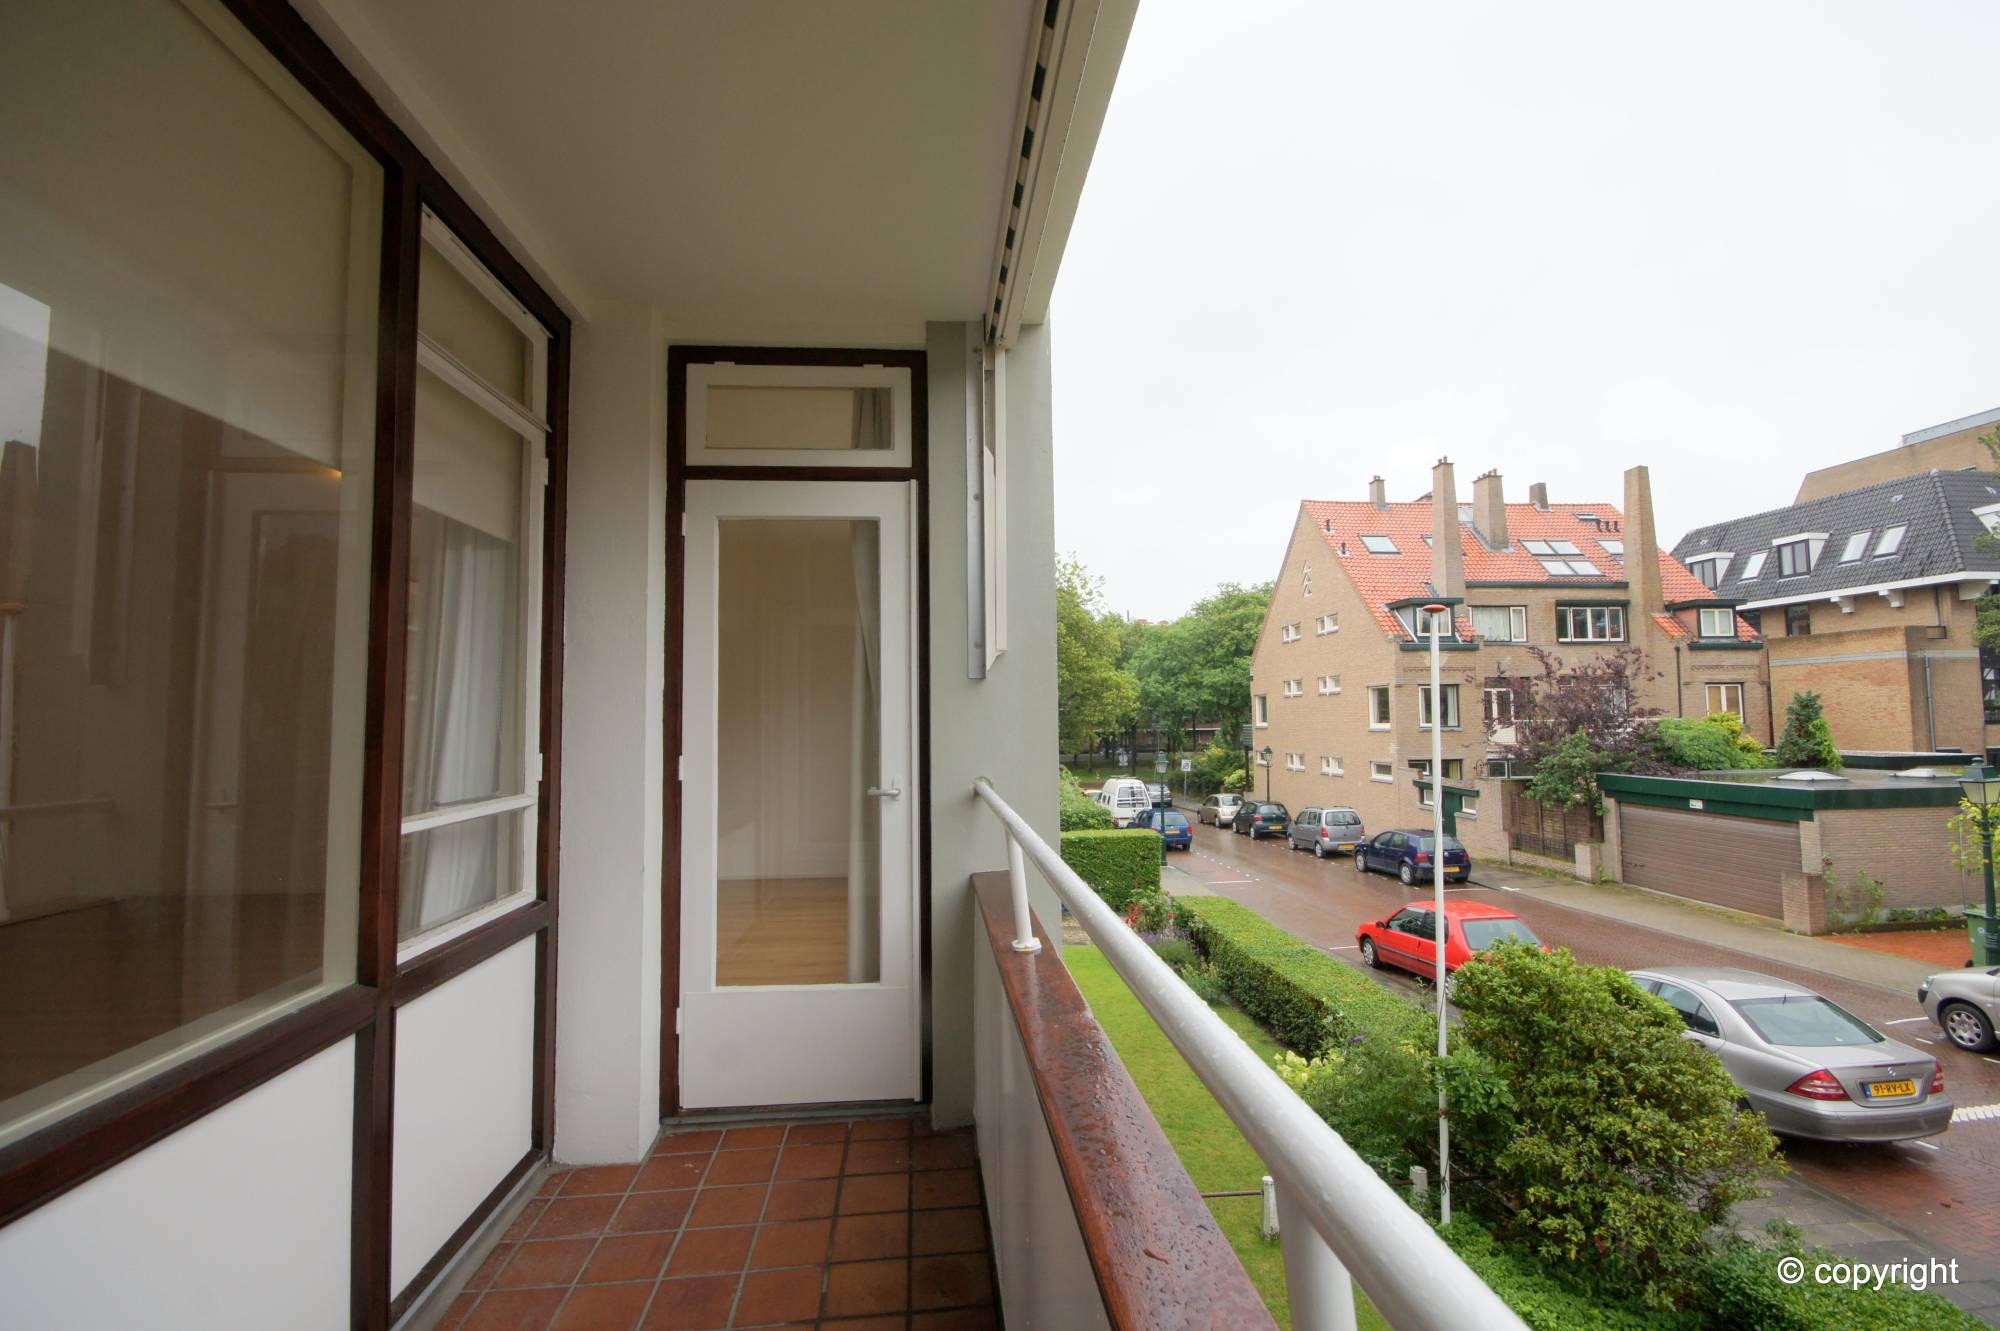 https://public.parariusoffice.nl/185/photos/huge/2590846.1522327765-737.JPG